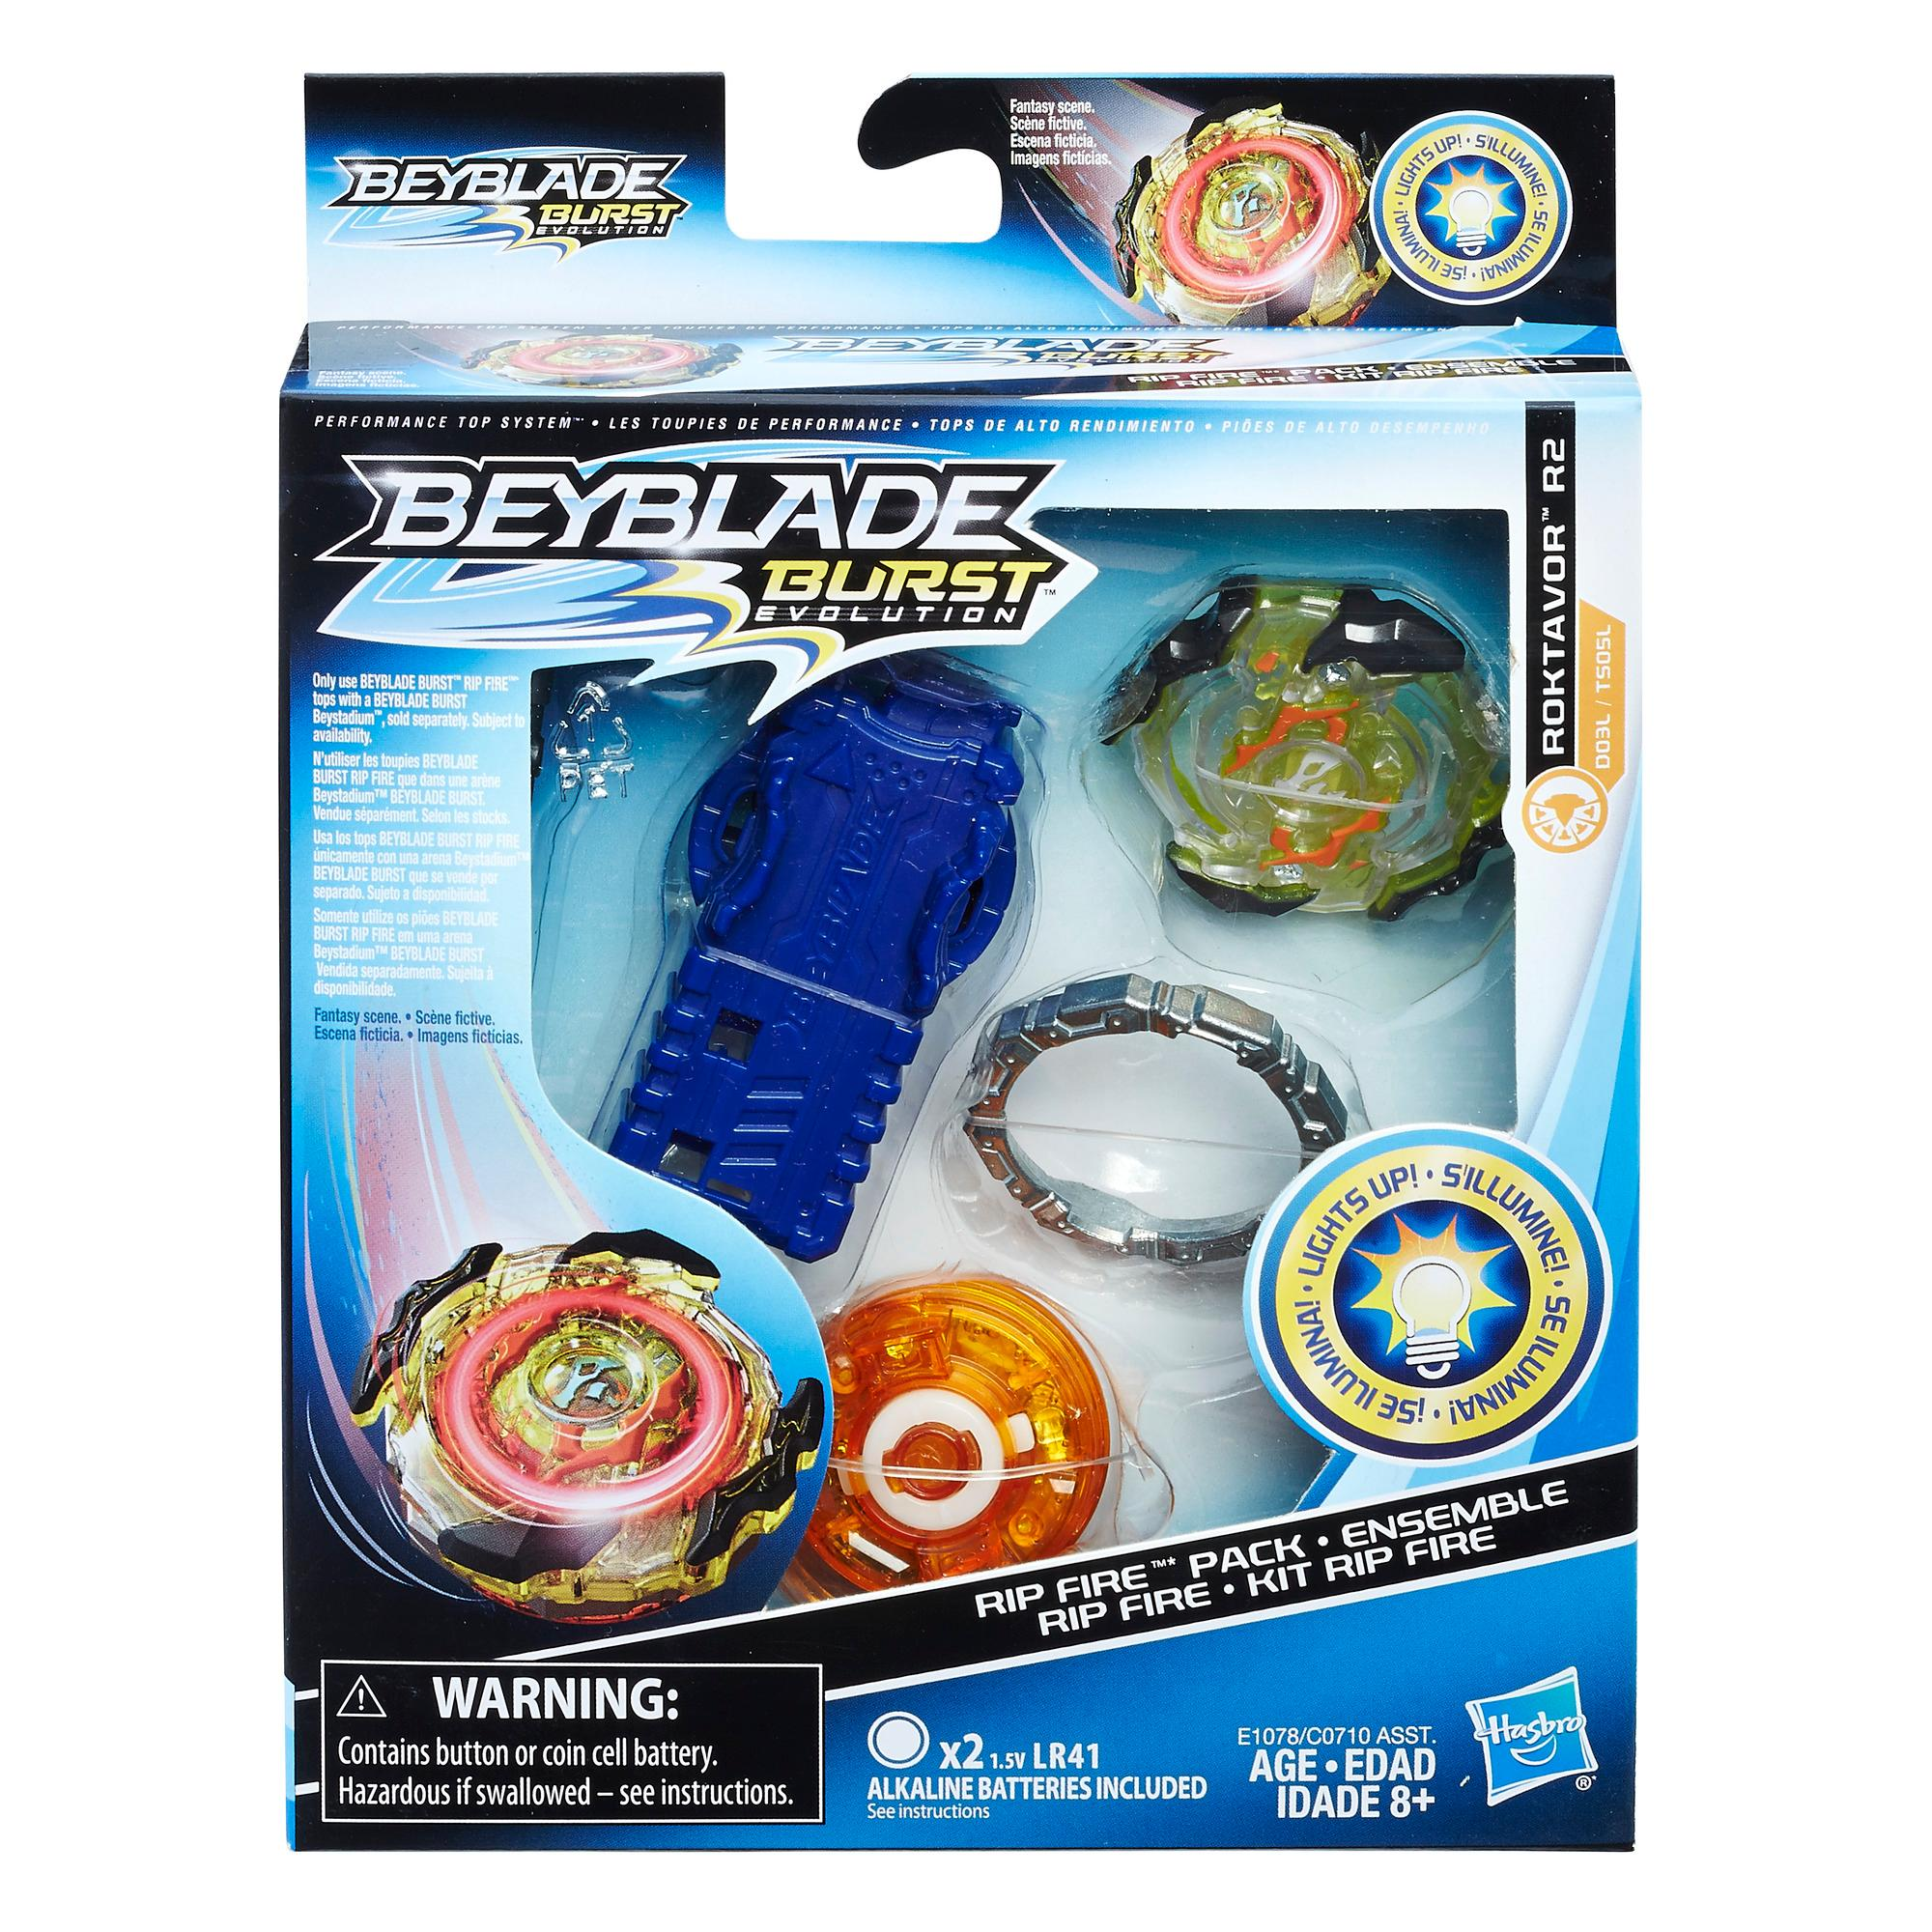 Beyblade Burst Evolution - Kit de départ Rip Fire Roktavor R2